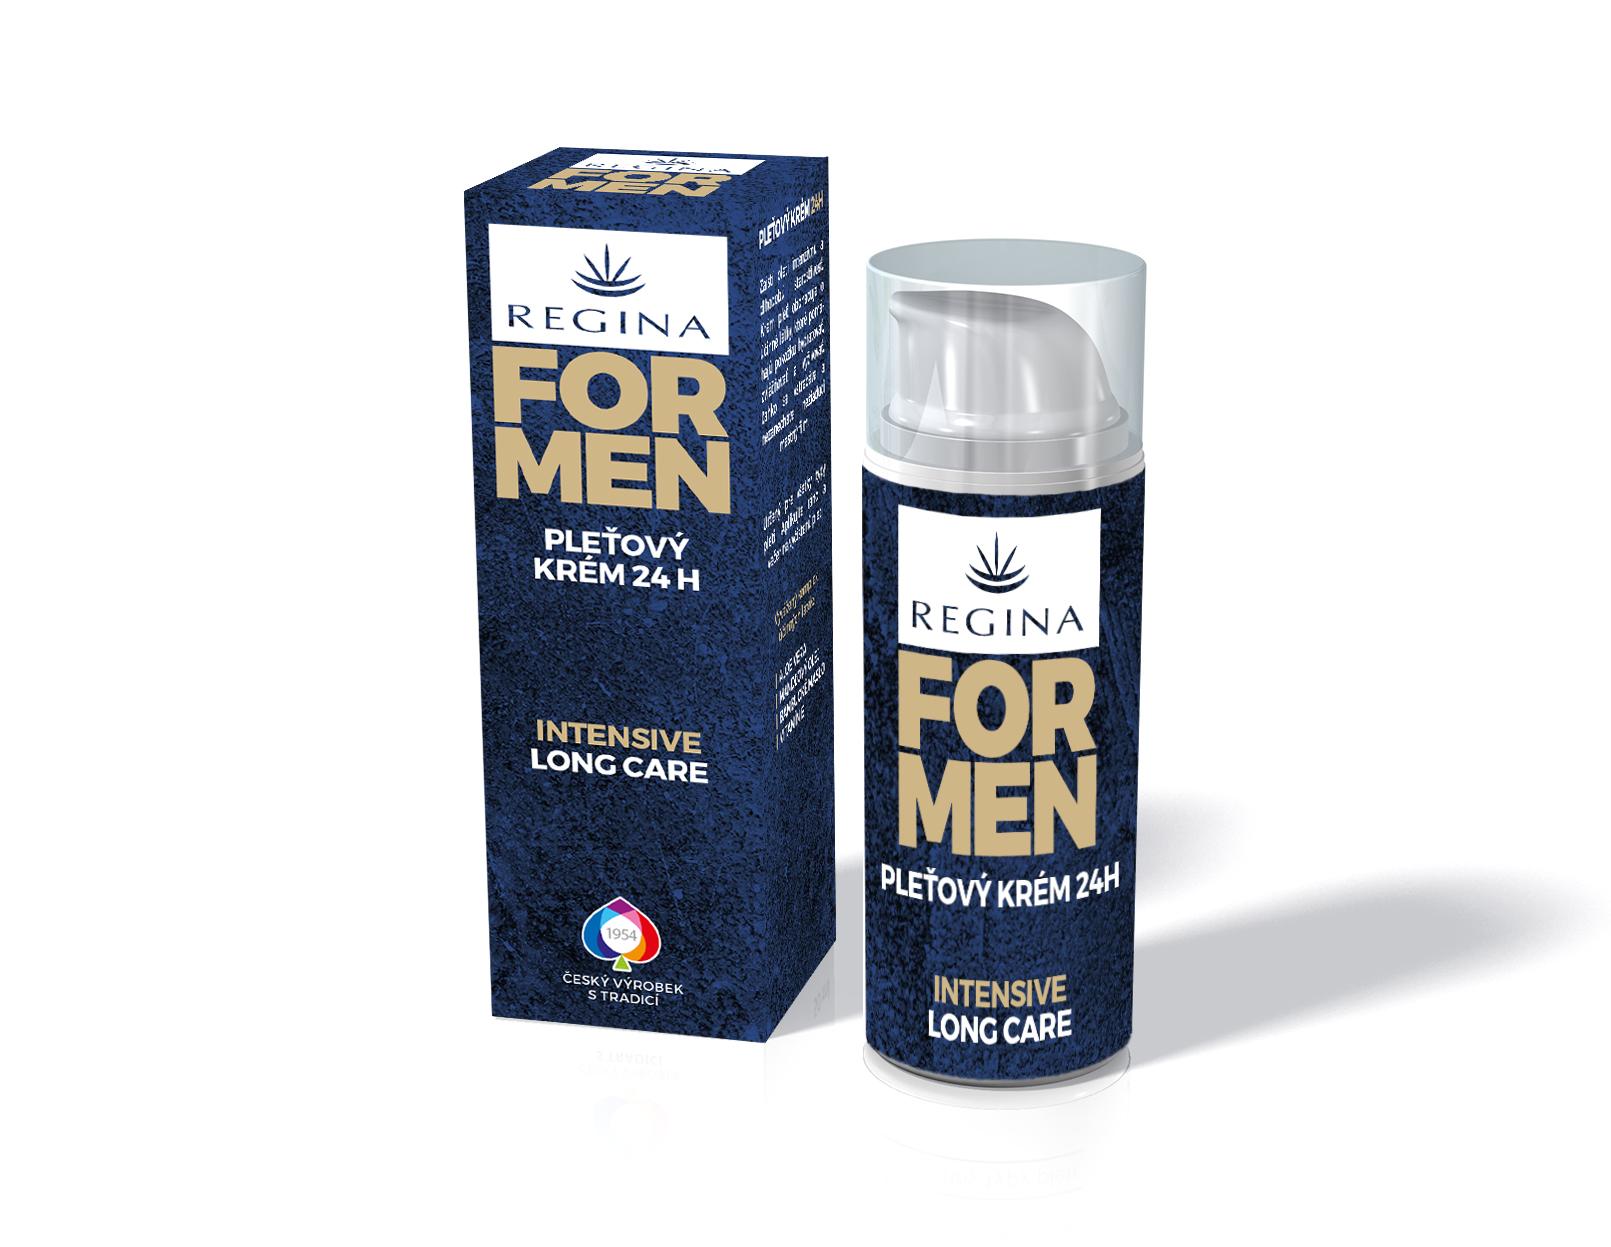 REGINA-FOR-MEN-Pletovy-krem-24h-6-2020-krabicka+krem